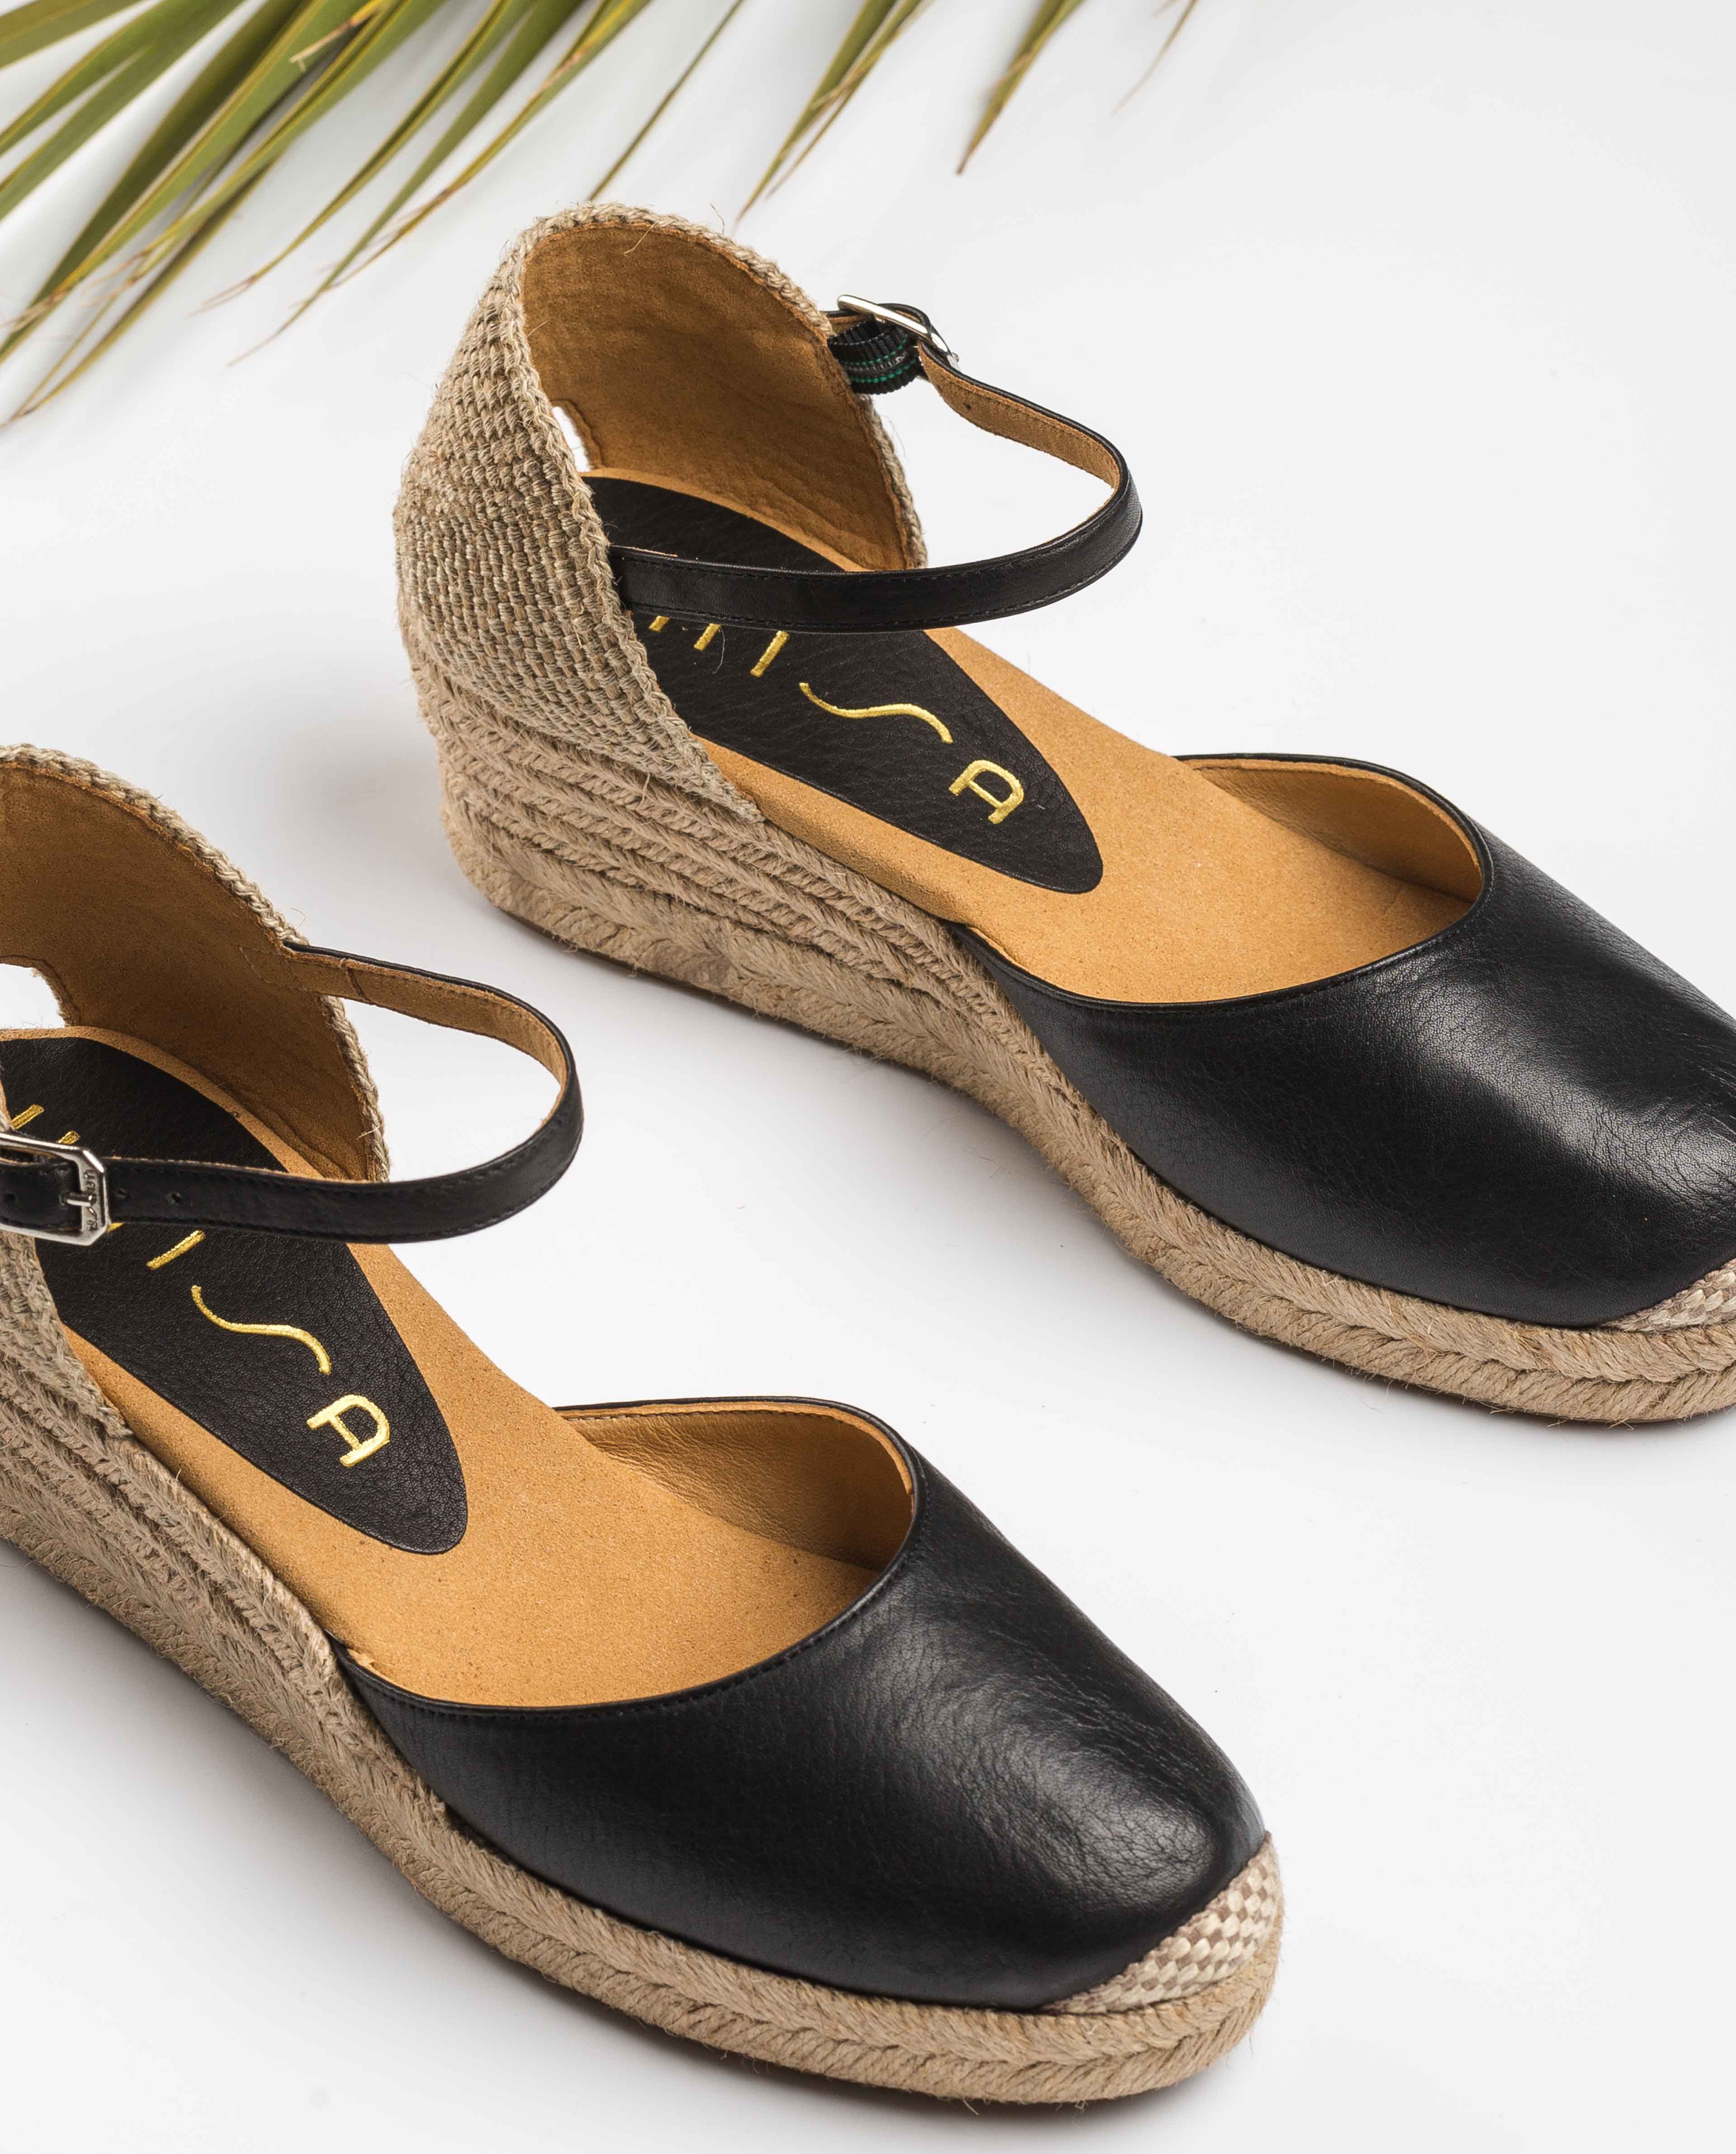 UNISA Low wedge leather espadrilles CISCA_20_STY black 2